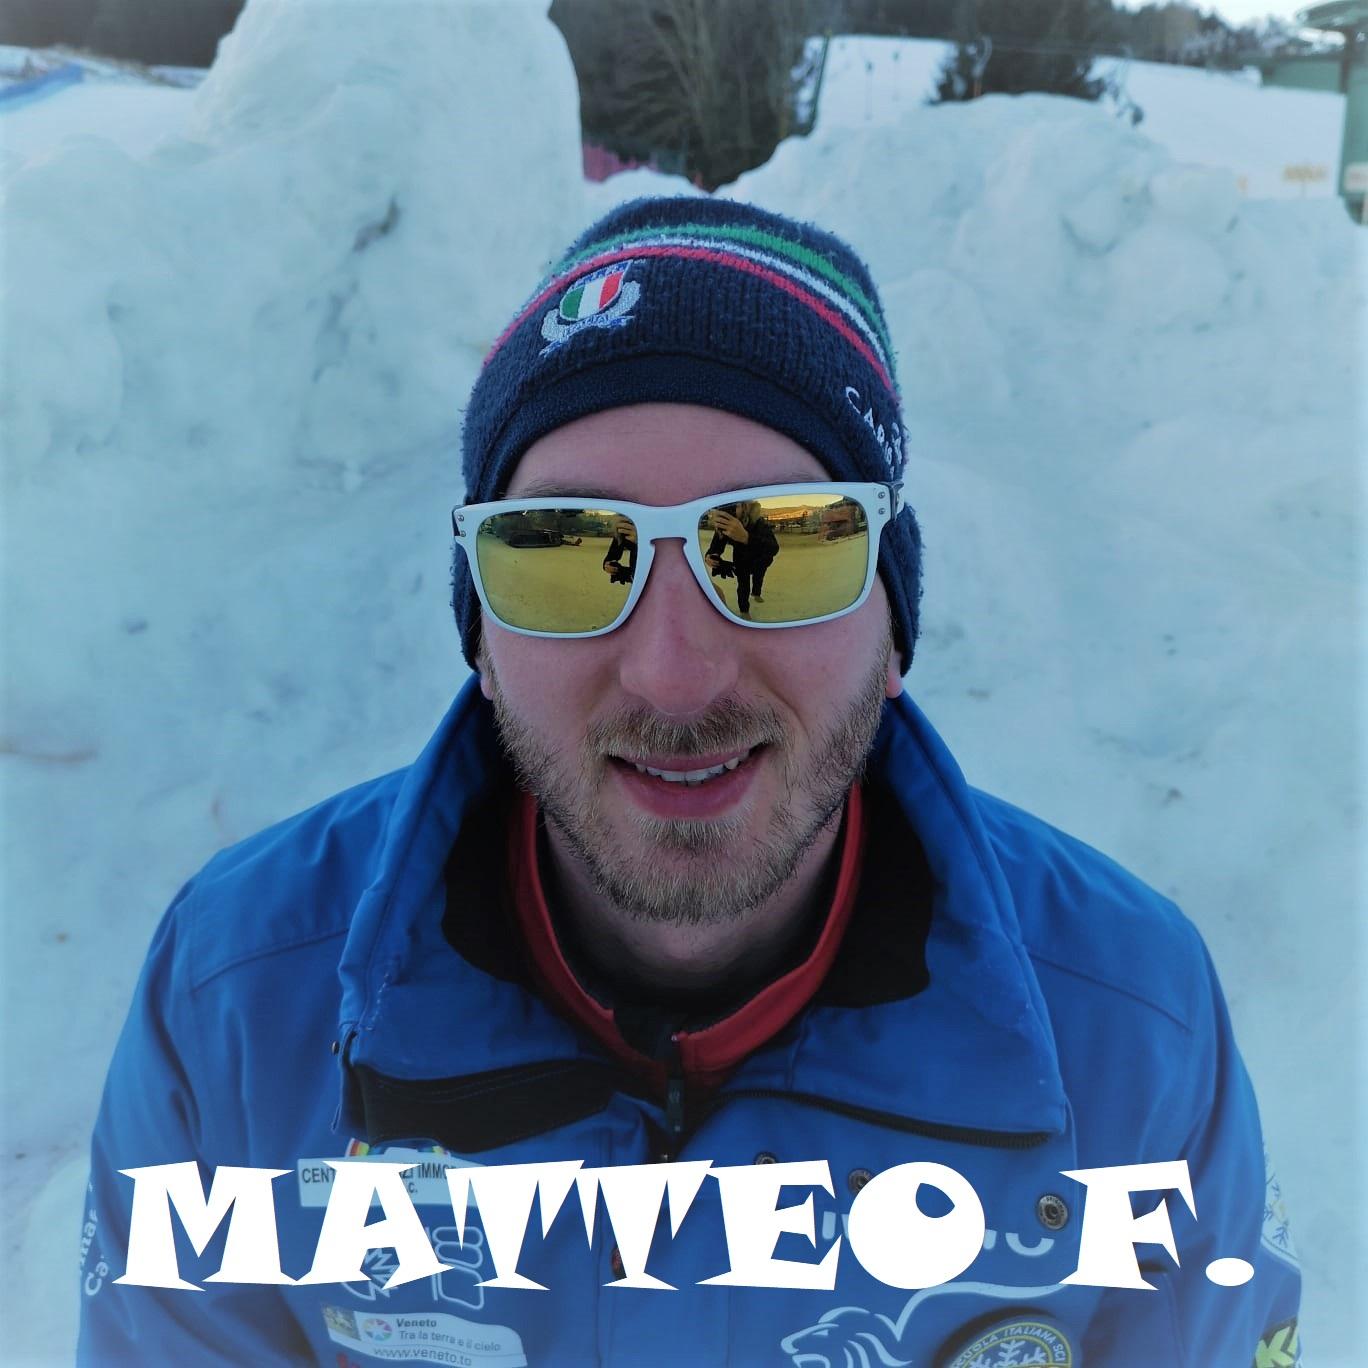 MATTEO FINCO